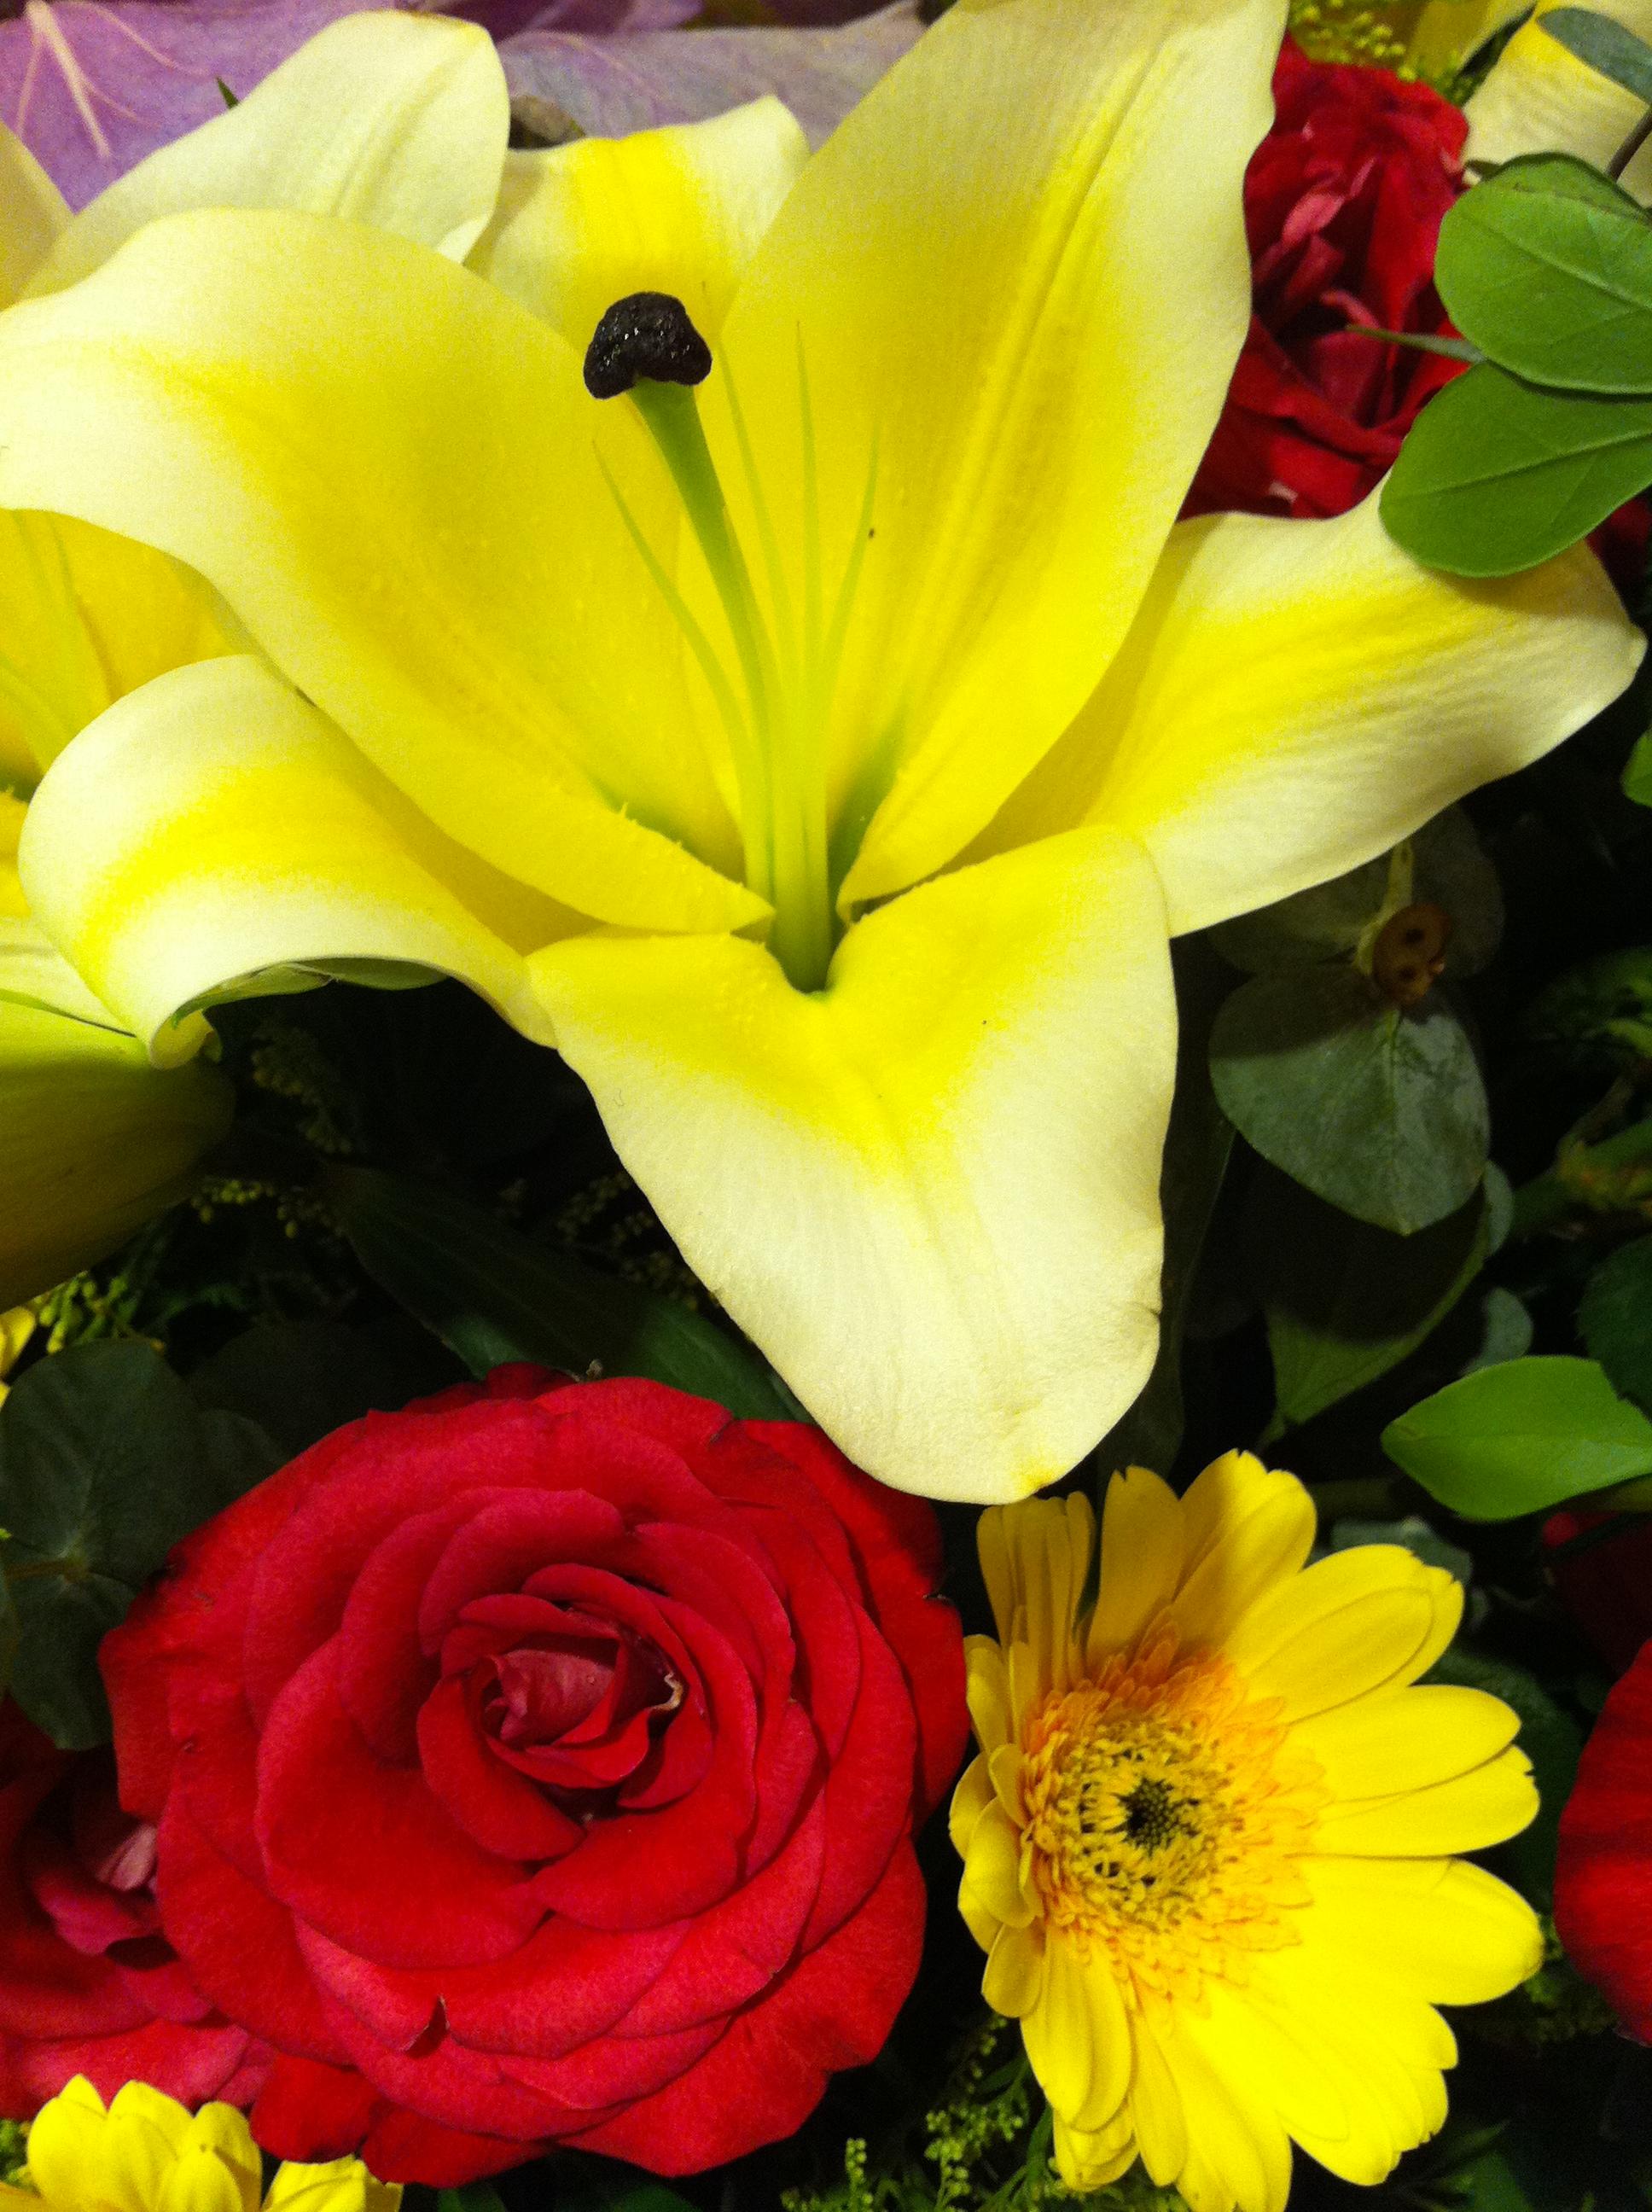 Description HK Sai Wan Ho flower July-2013 red Rose yellow Lily Daisy ...